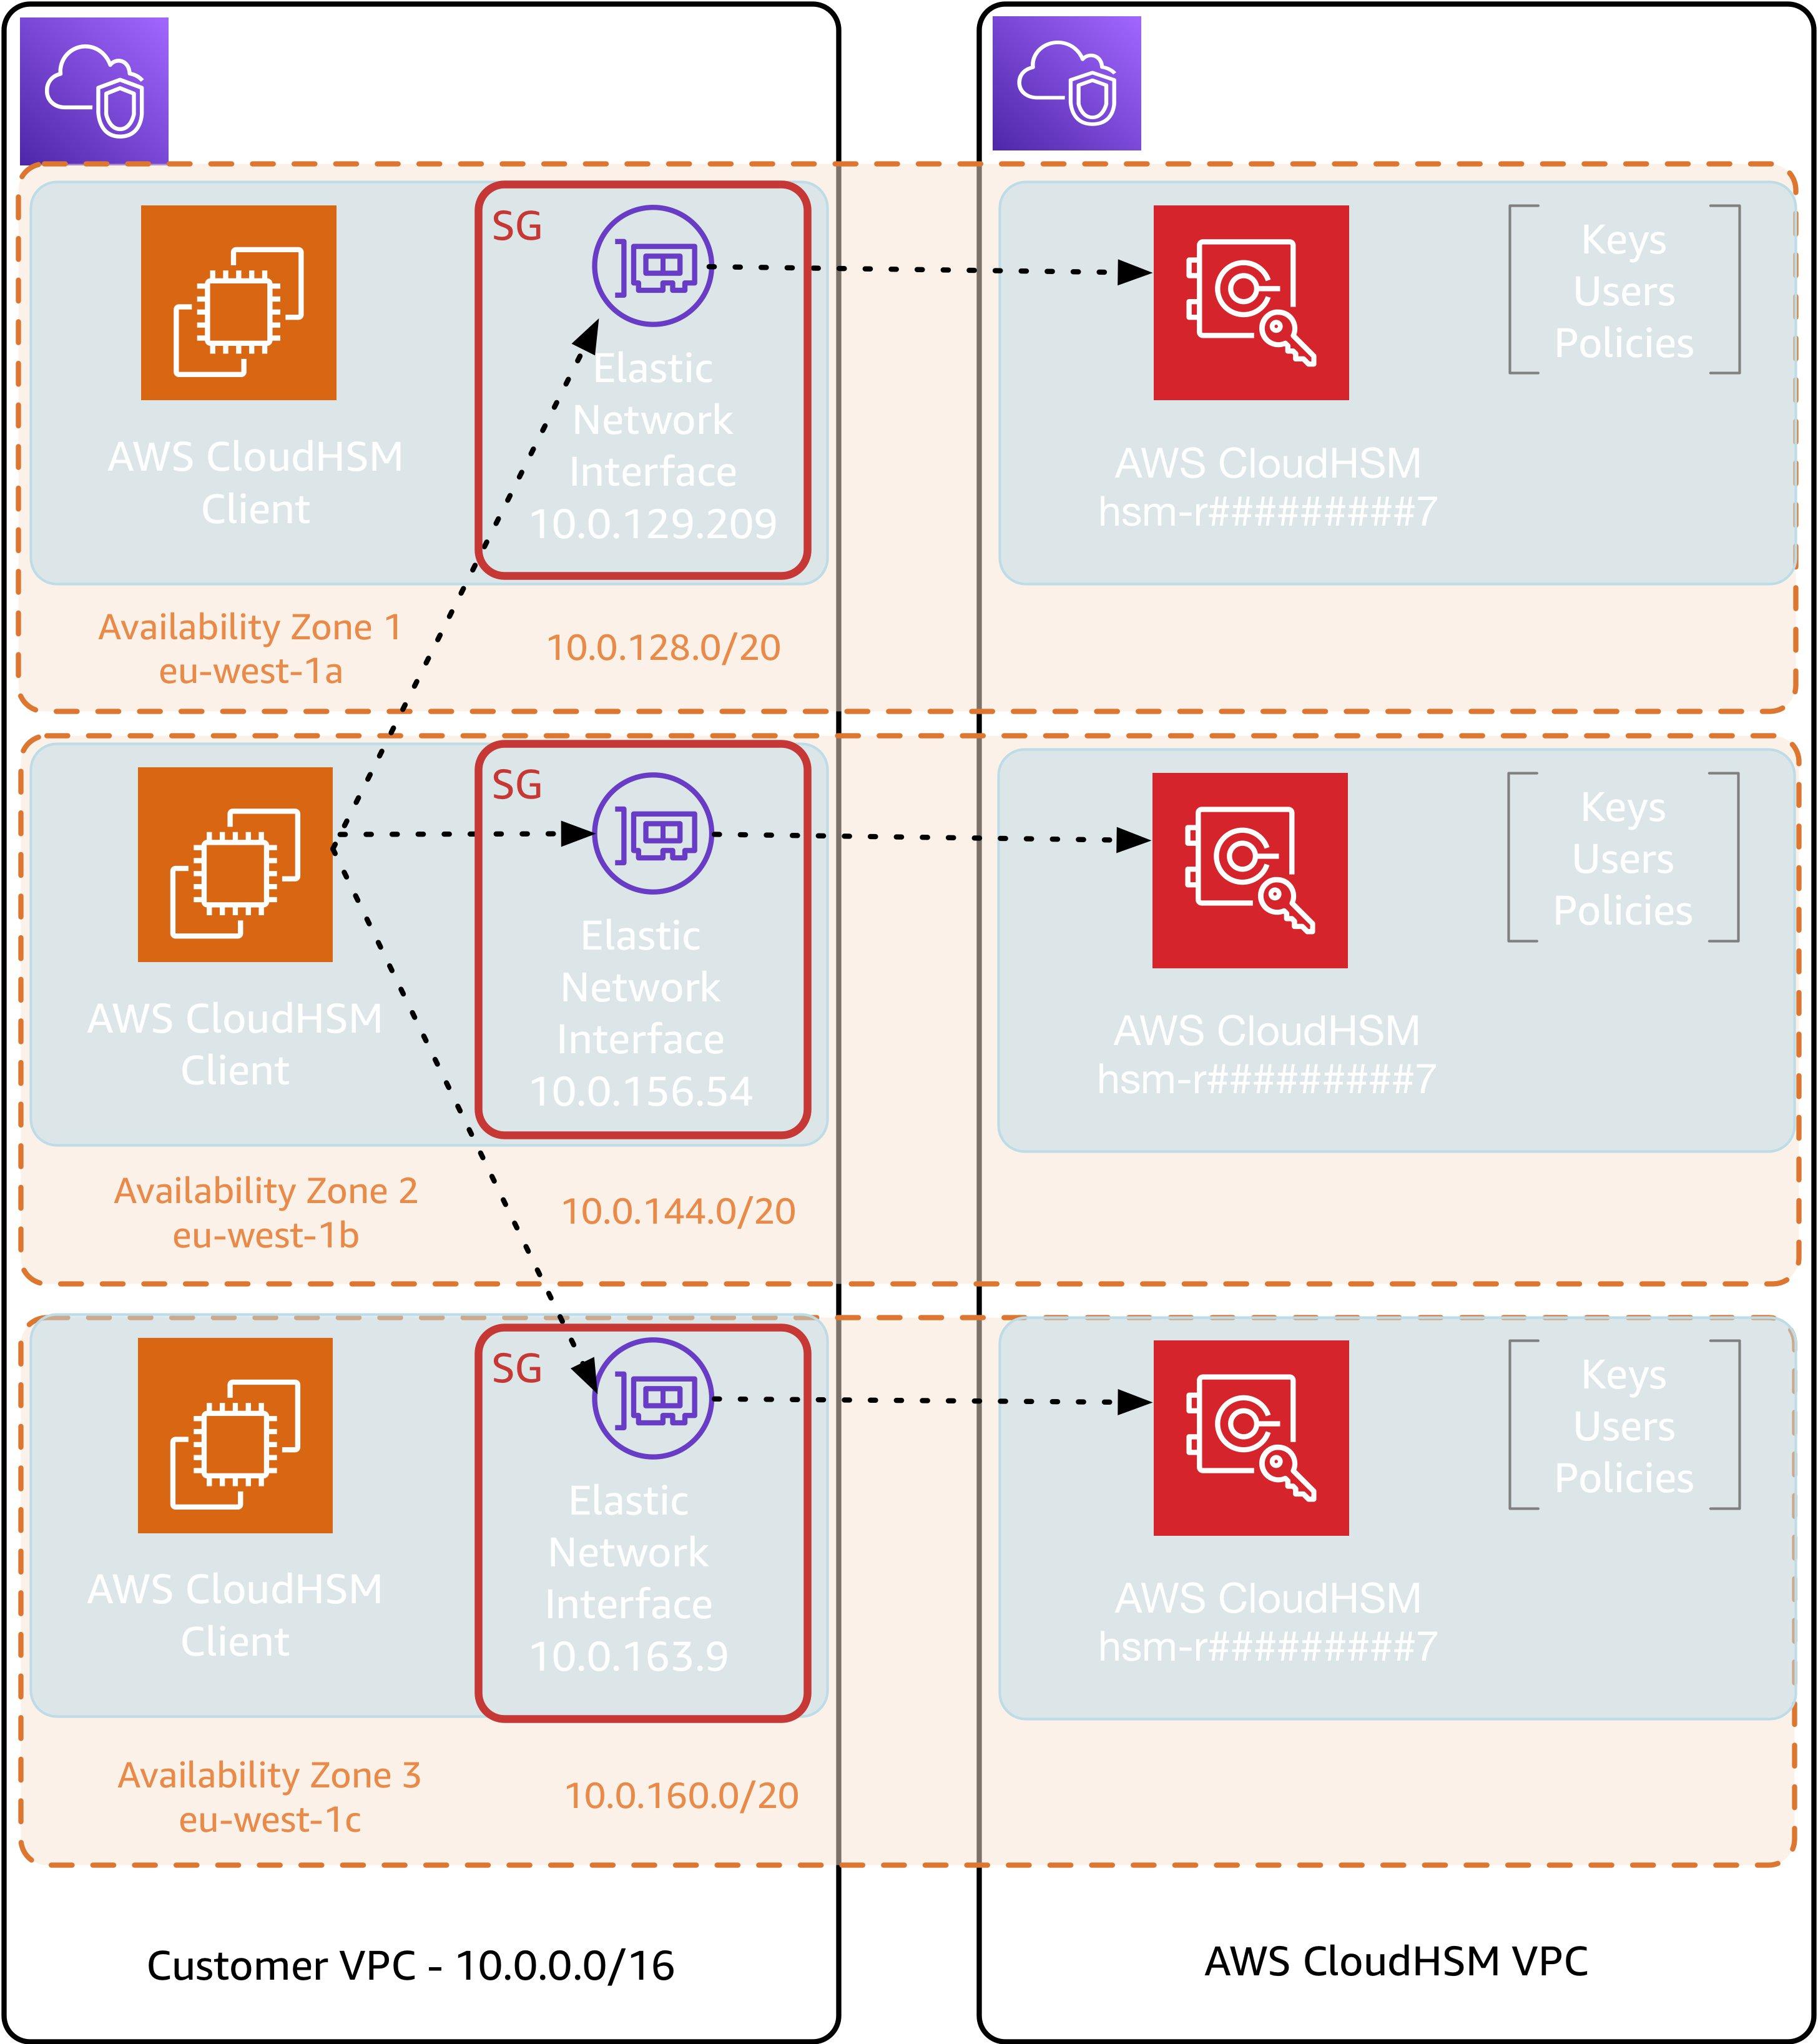 Figure 2: CloudHSM architecture using multiple AZs